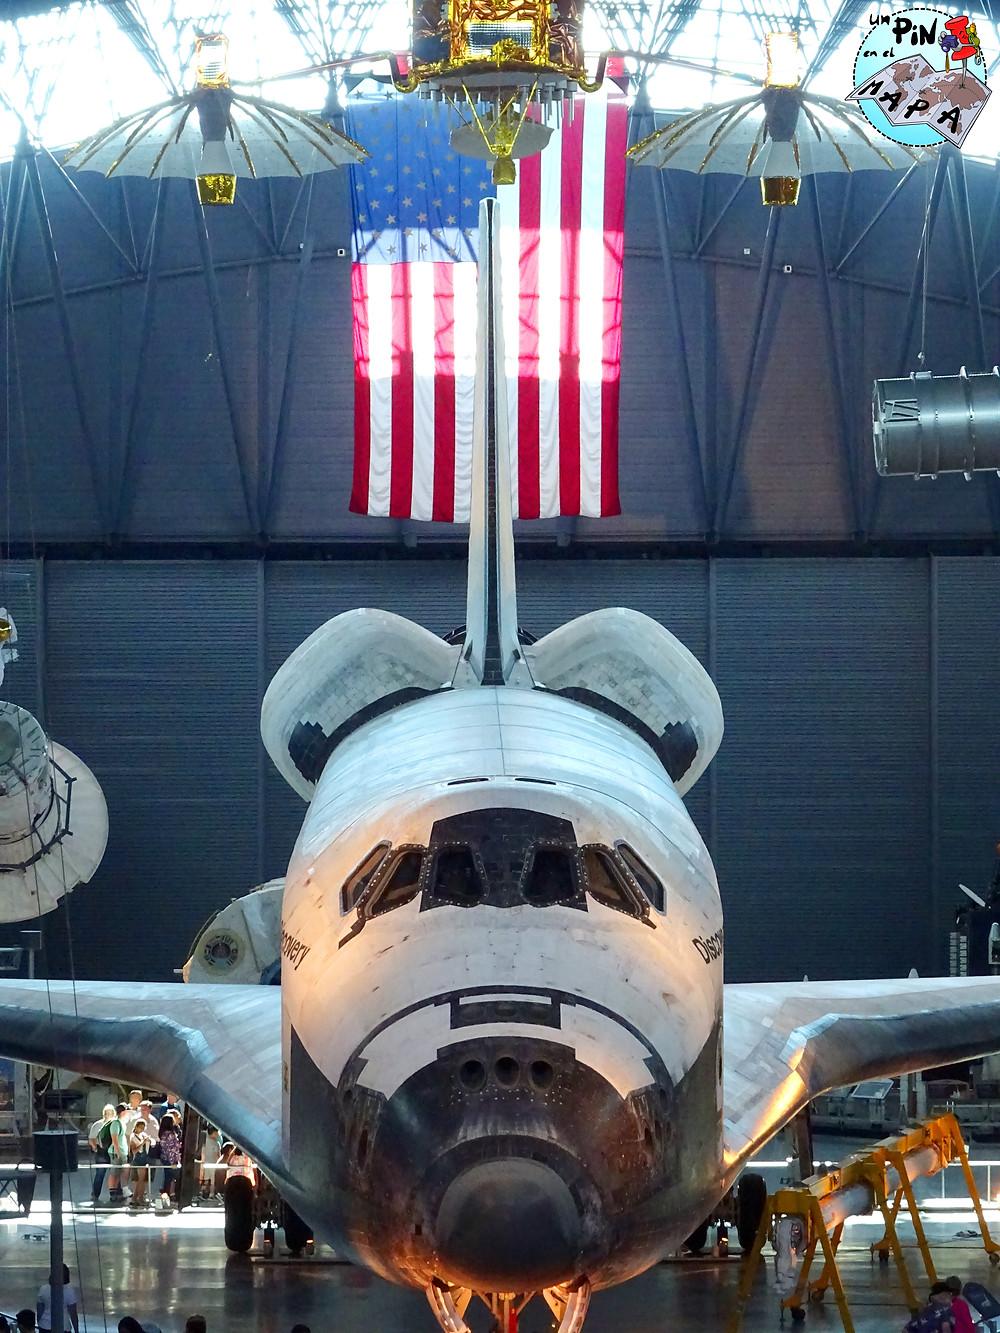 Transbordador espacial Discovery en Steven F. Udvar – Hazy Center | Un Pin en el Mapa